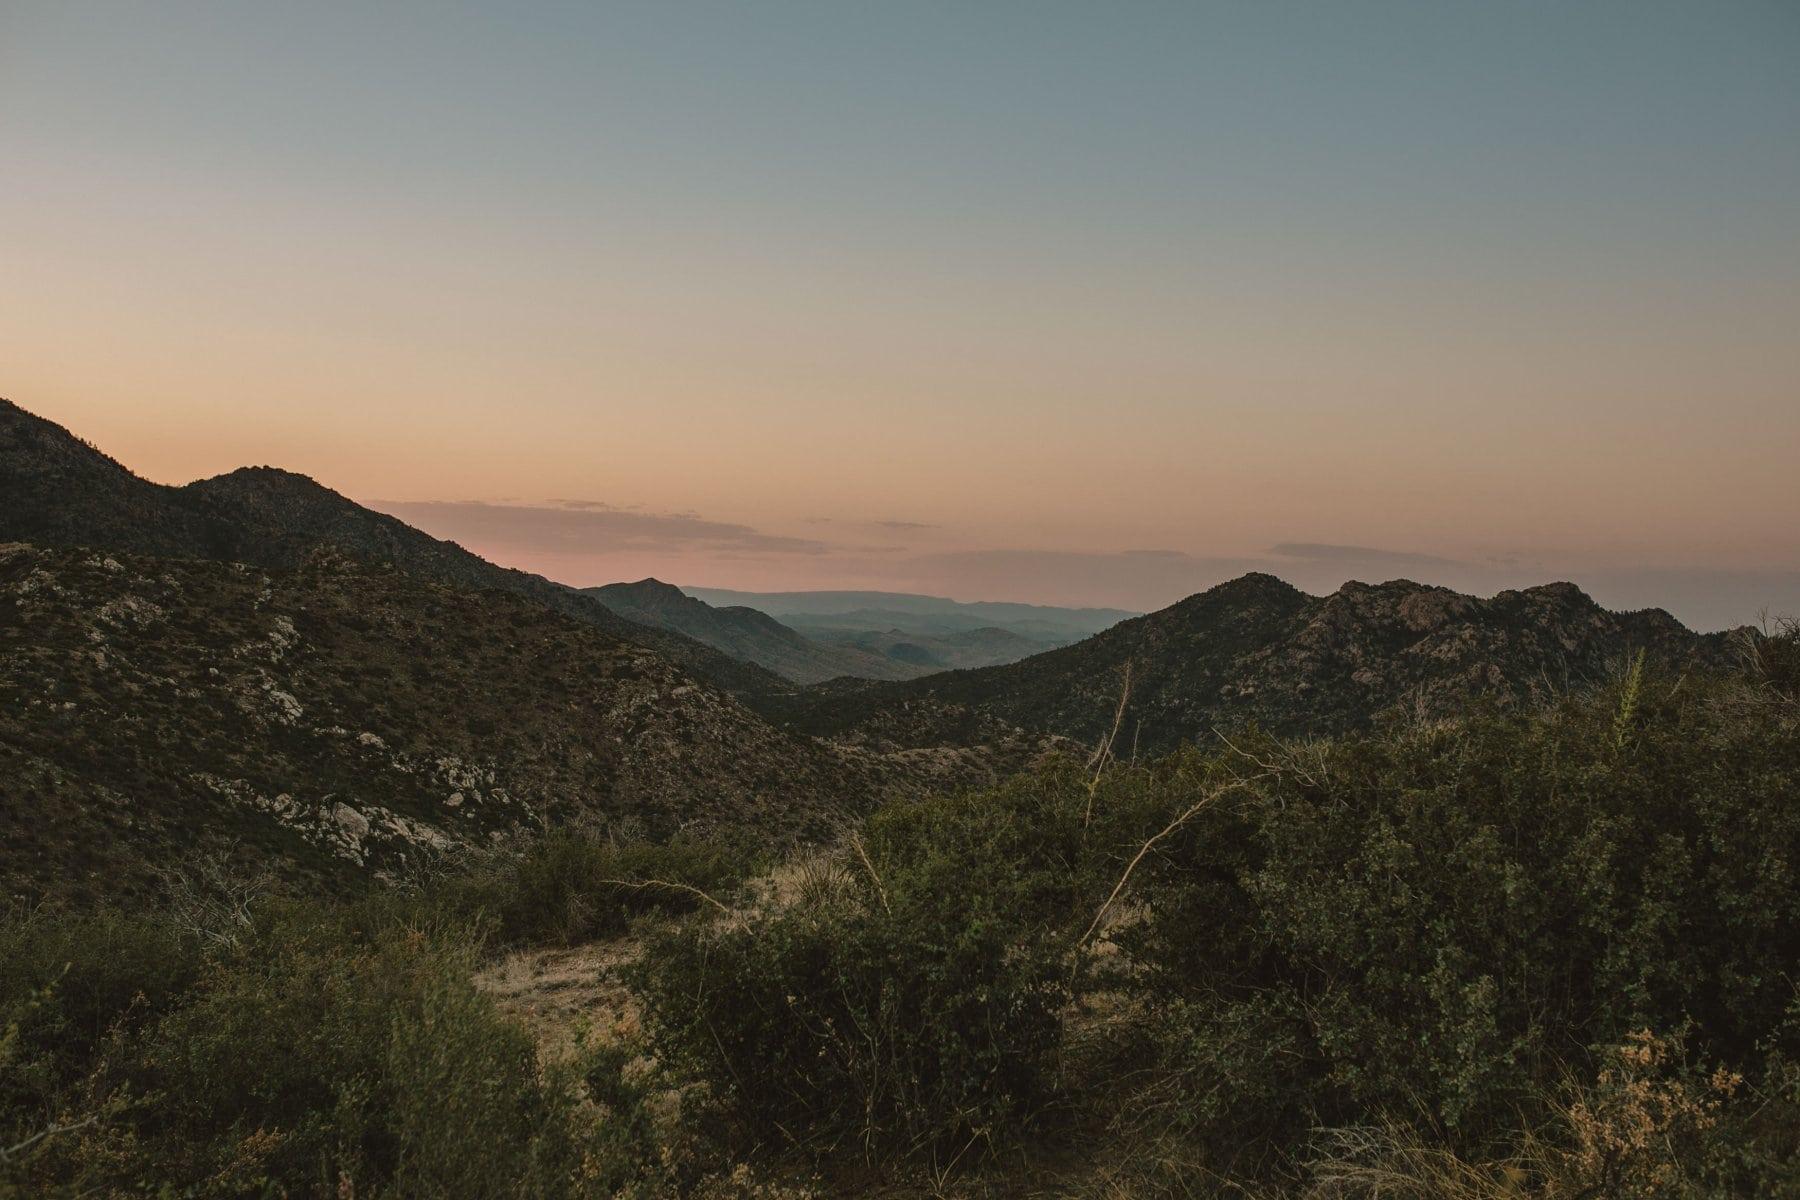 Prescott National Forest Bradshaw Mountains at sunset